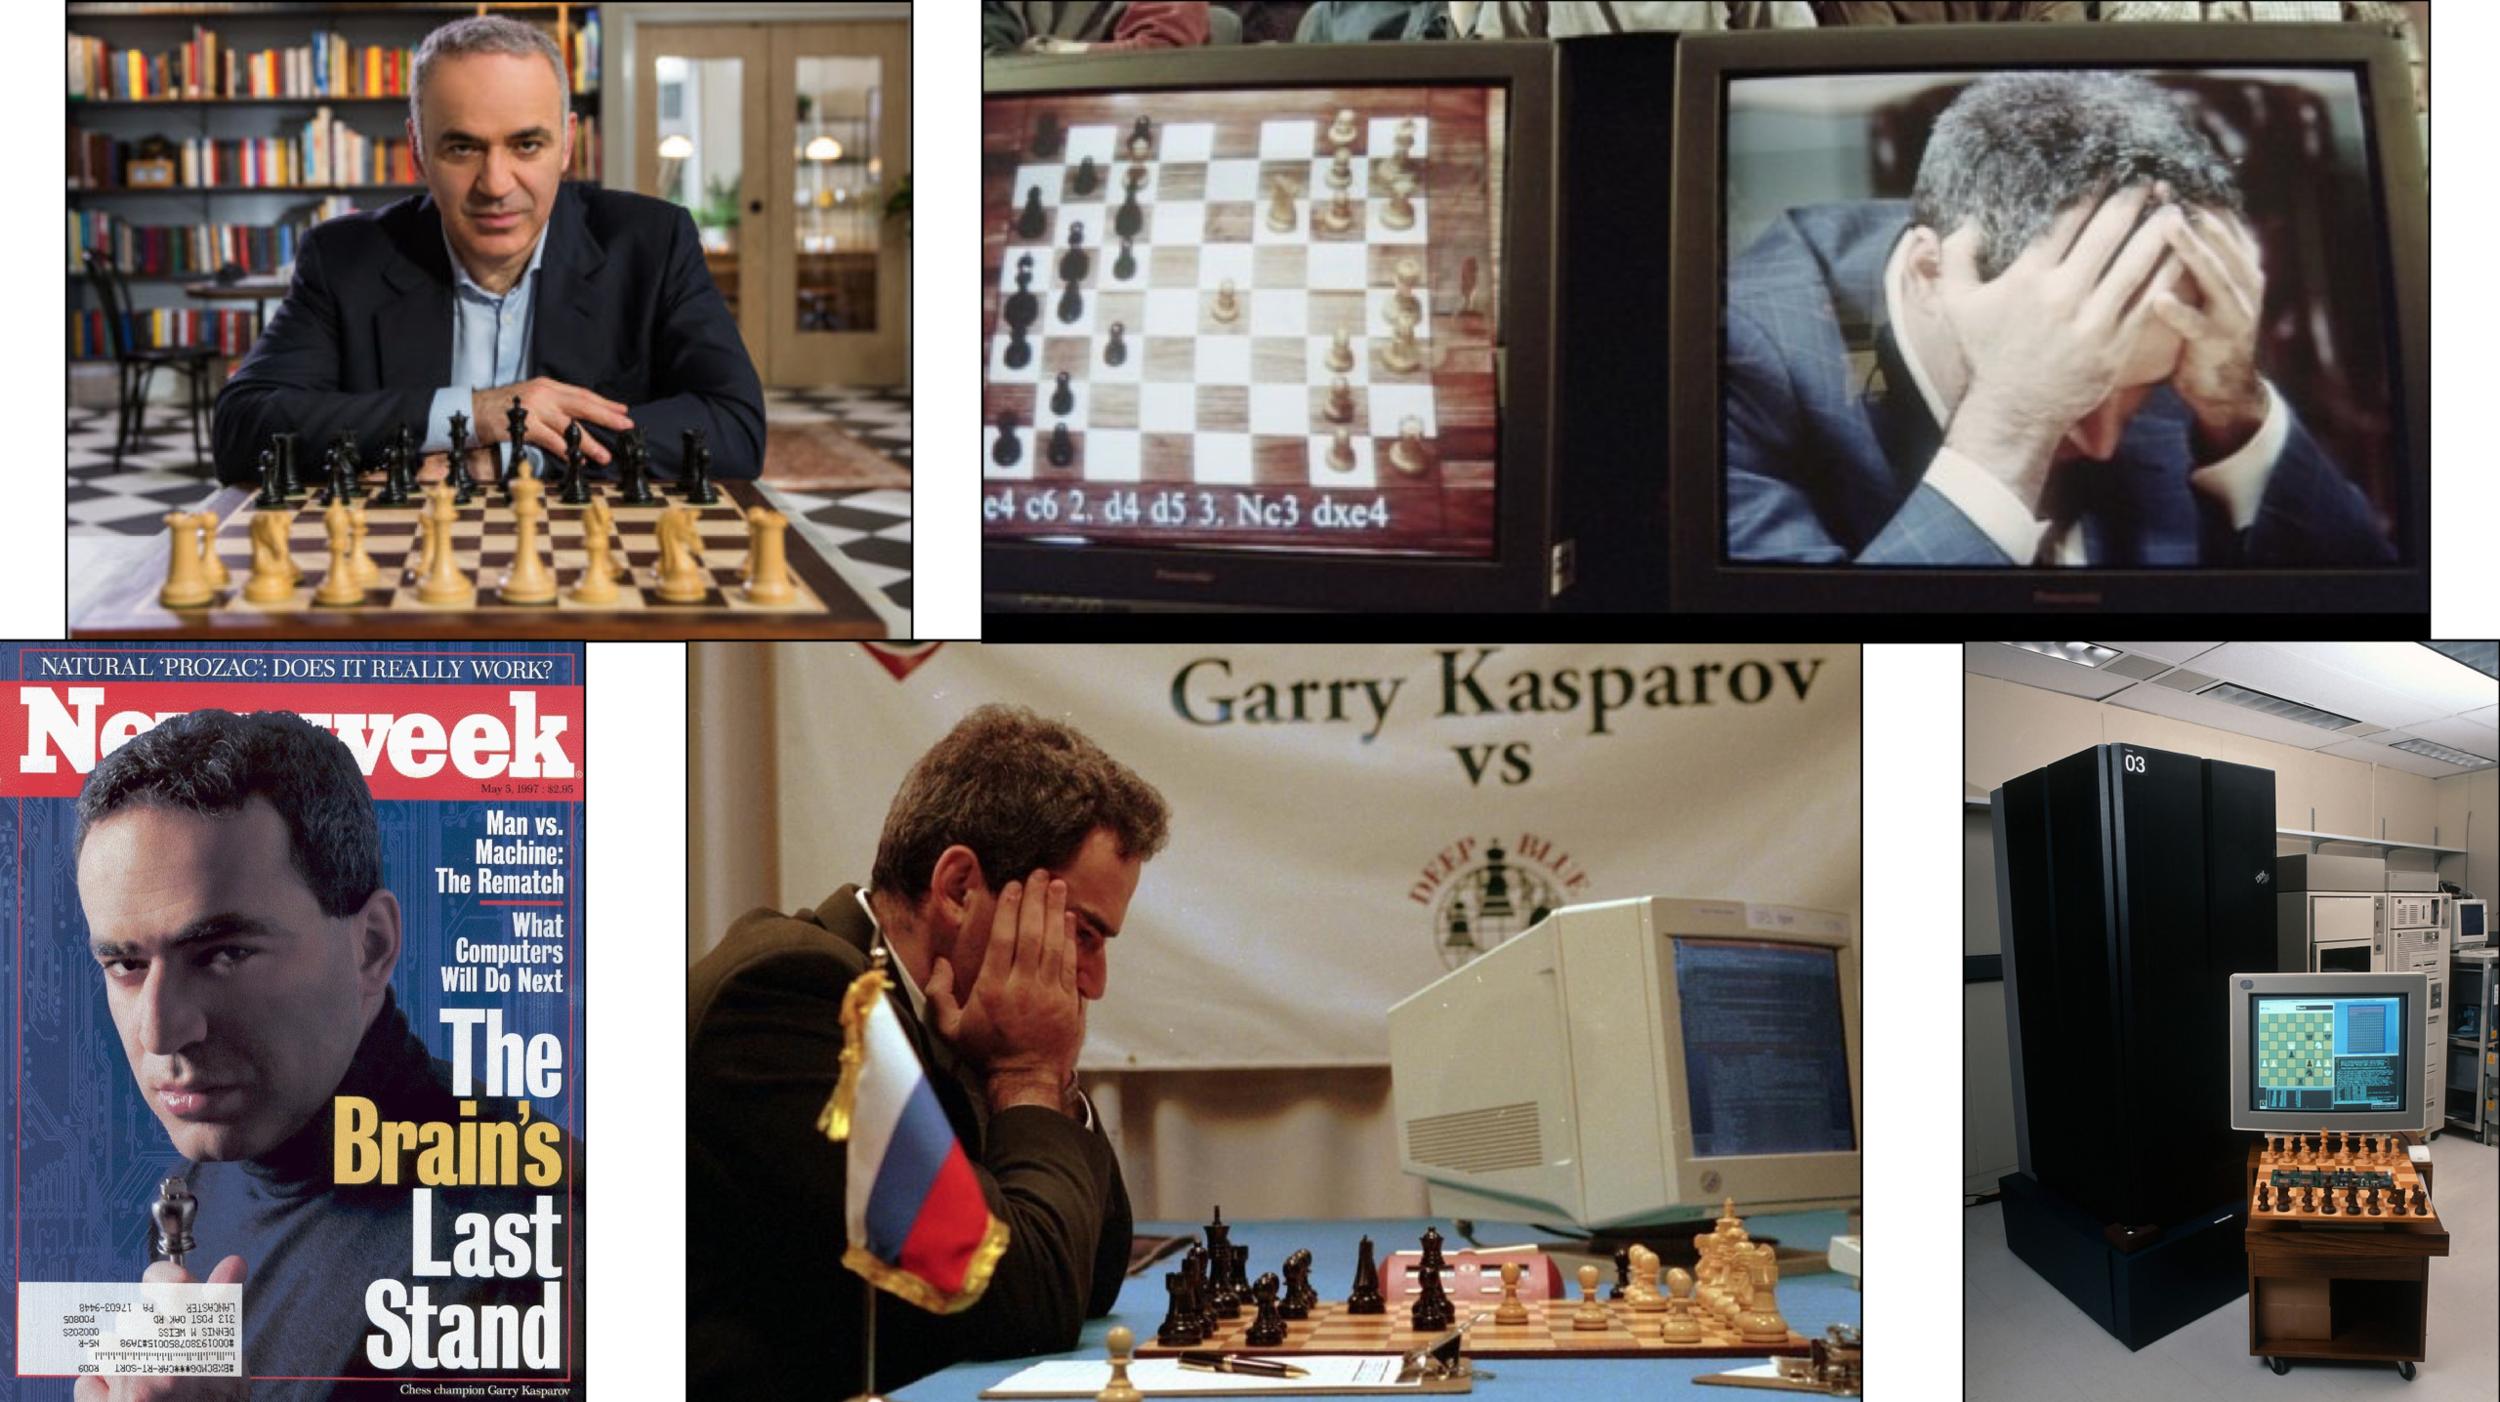 Kasparov-IBM Deep Blue - LA MACCHINA BATTE L'UOMO[New York] 1997